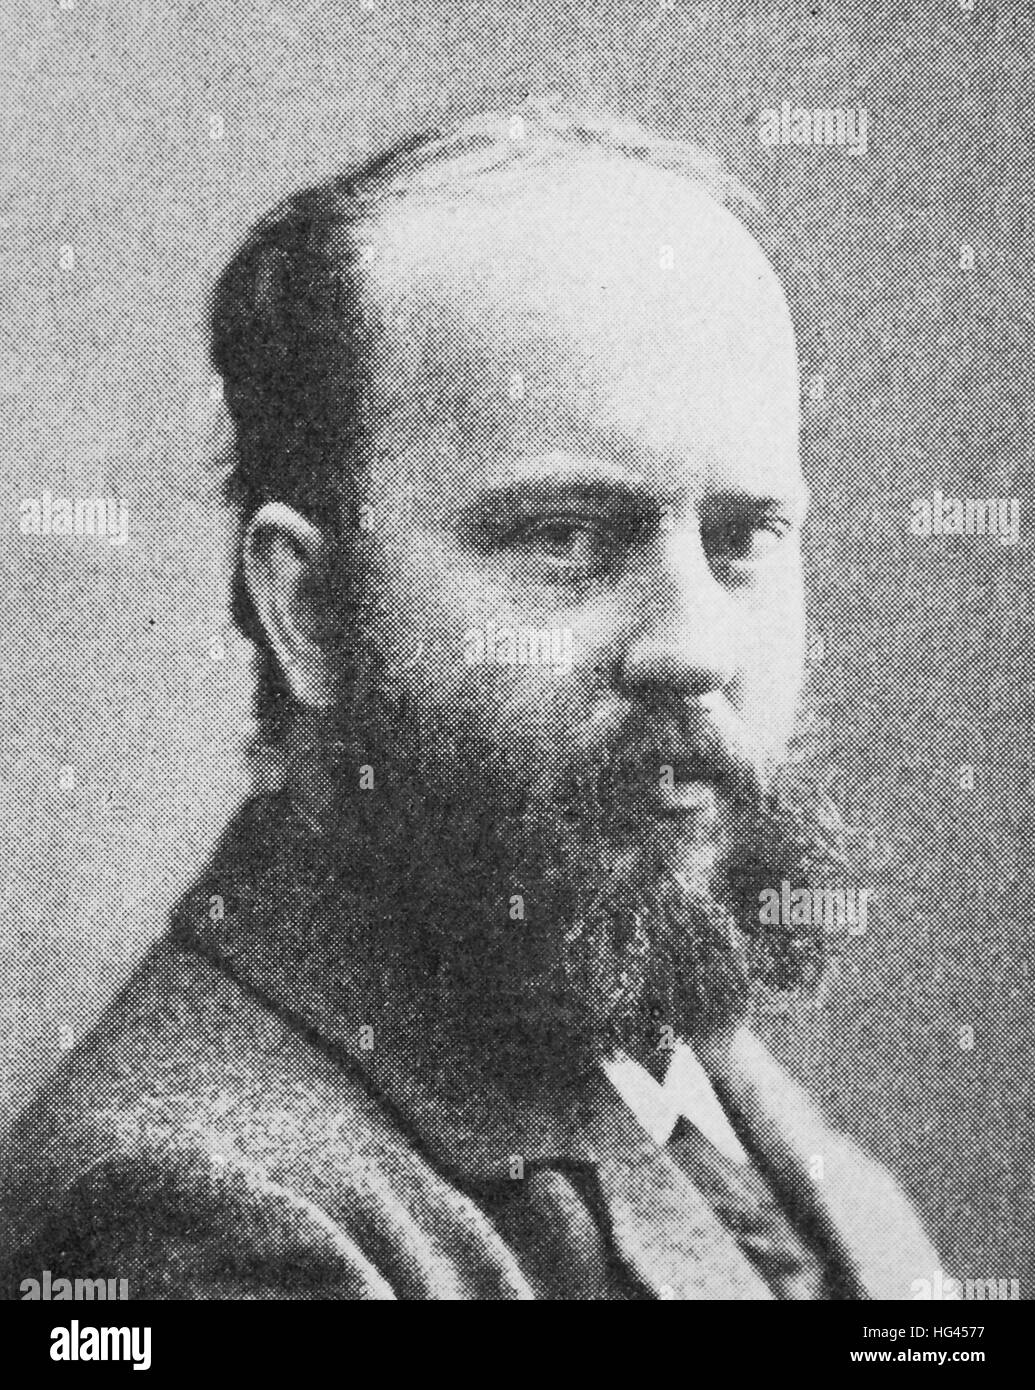 Ferdinand Avenarius, 20 December 1856 - 22 September 1923, was a lyric poet, a leading representative of the culture - Stock Image